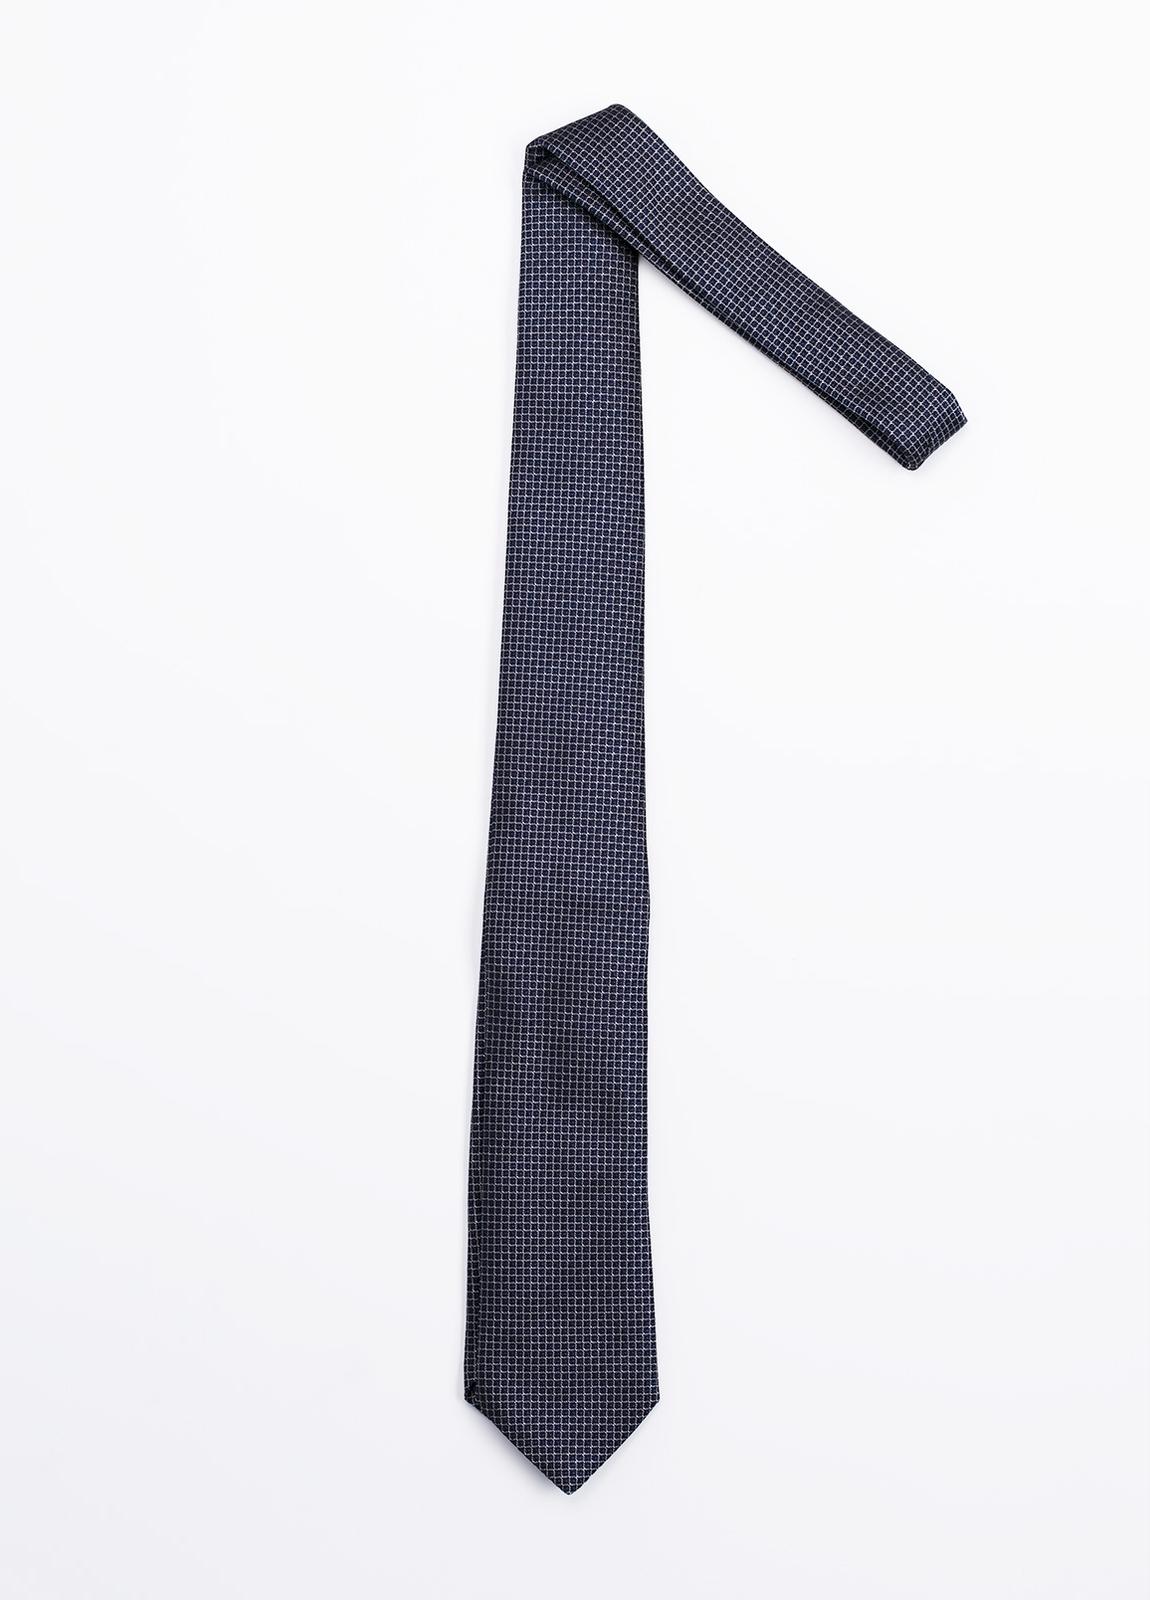 Corbata Formal Wear microdibujo, color azul marino. Pala 7,5 cm. 100% Seda. - Ítem1